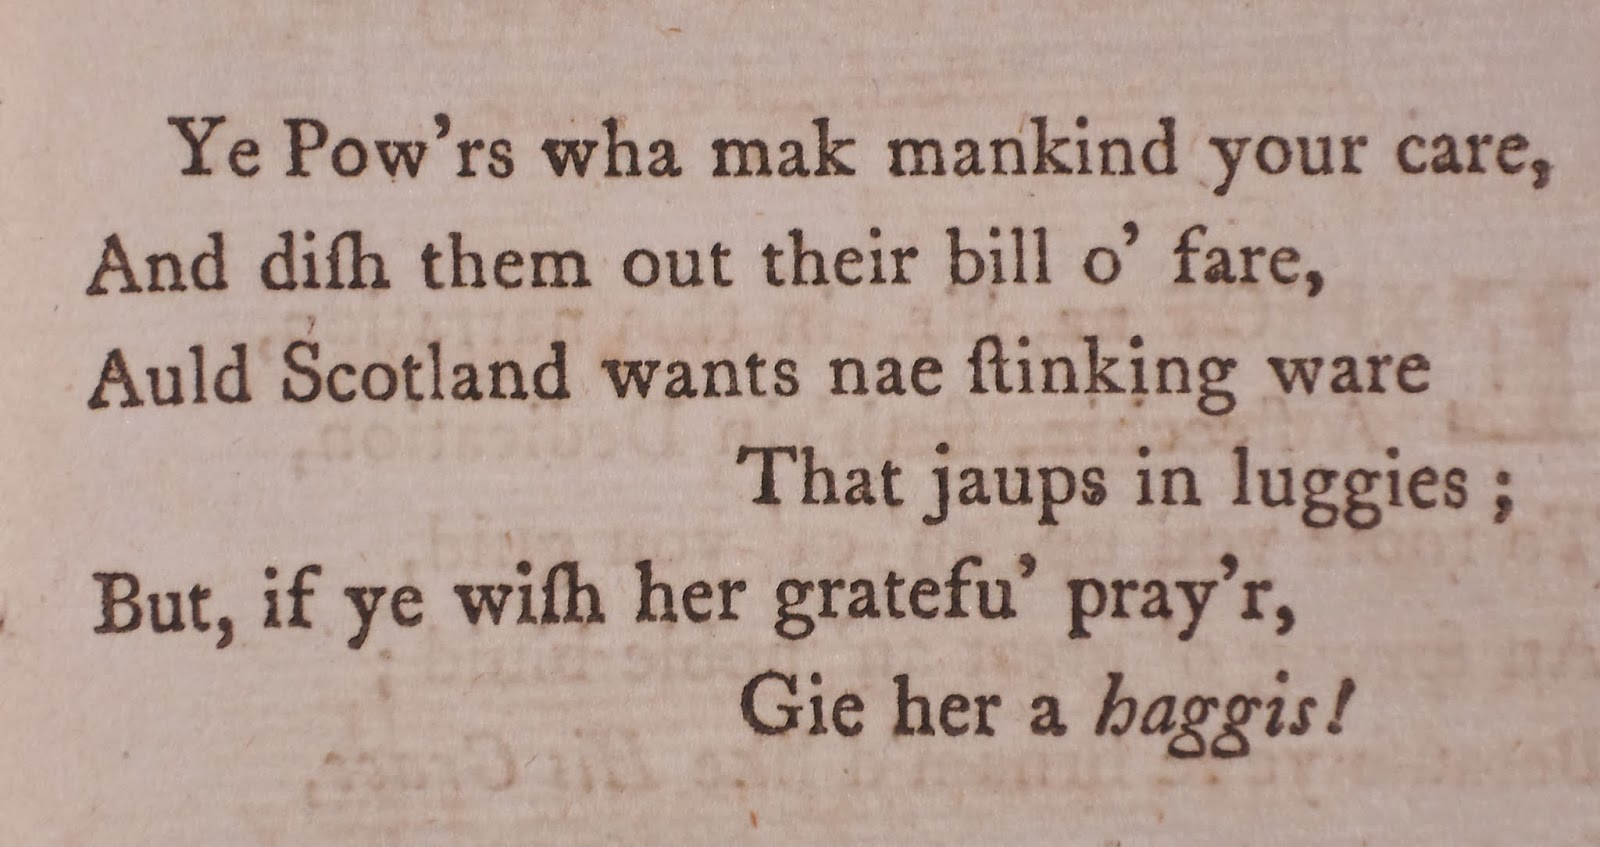 A printed verse on haggis.